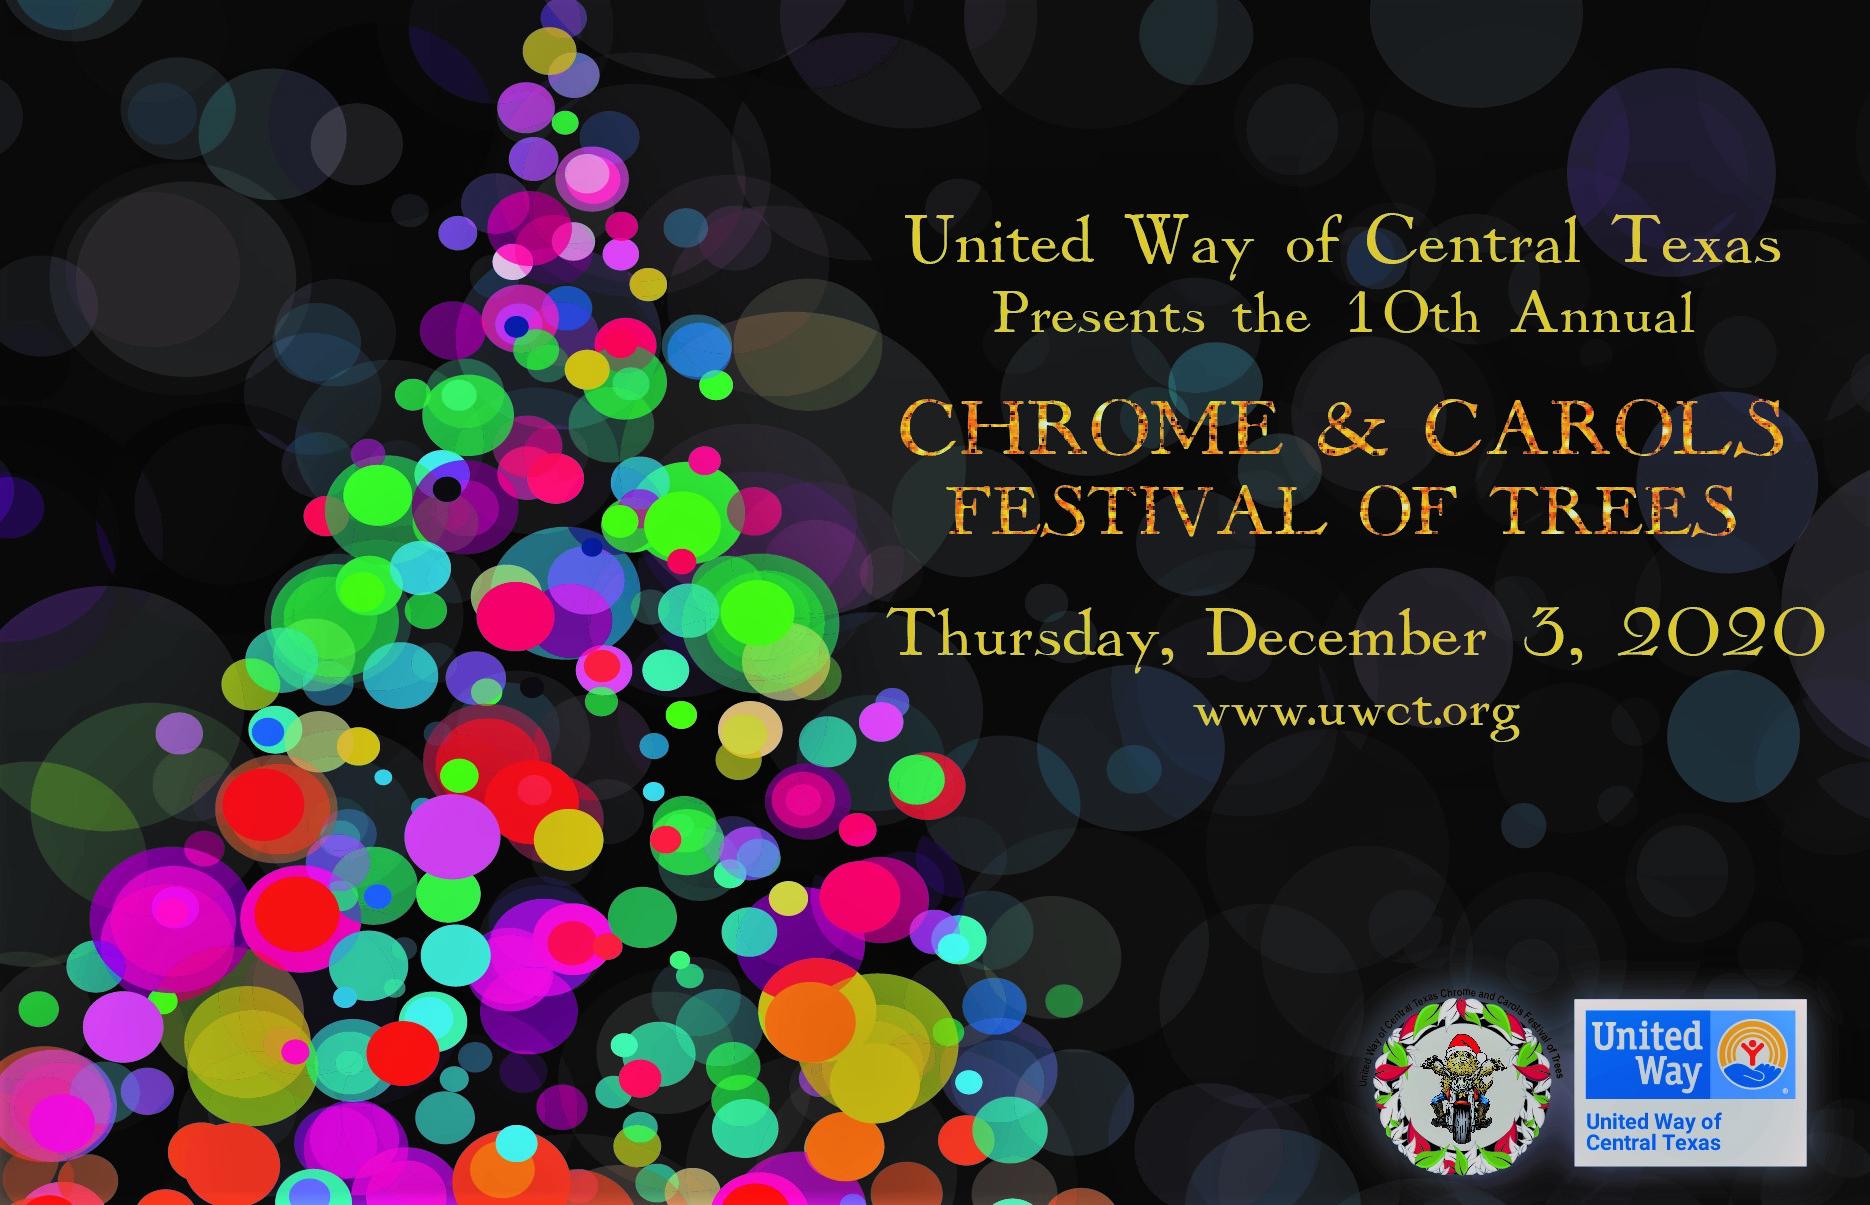 United Way Christmas Help 2020 Chrome & Carols   United Way of Central Texas